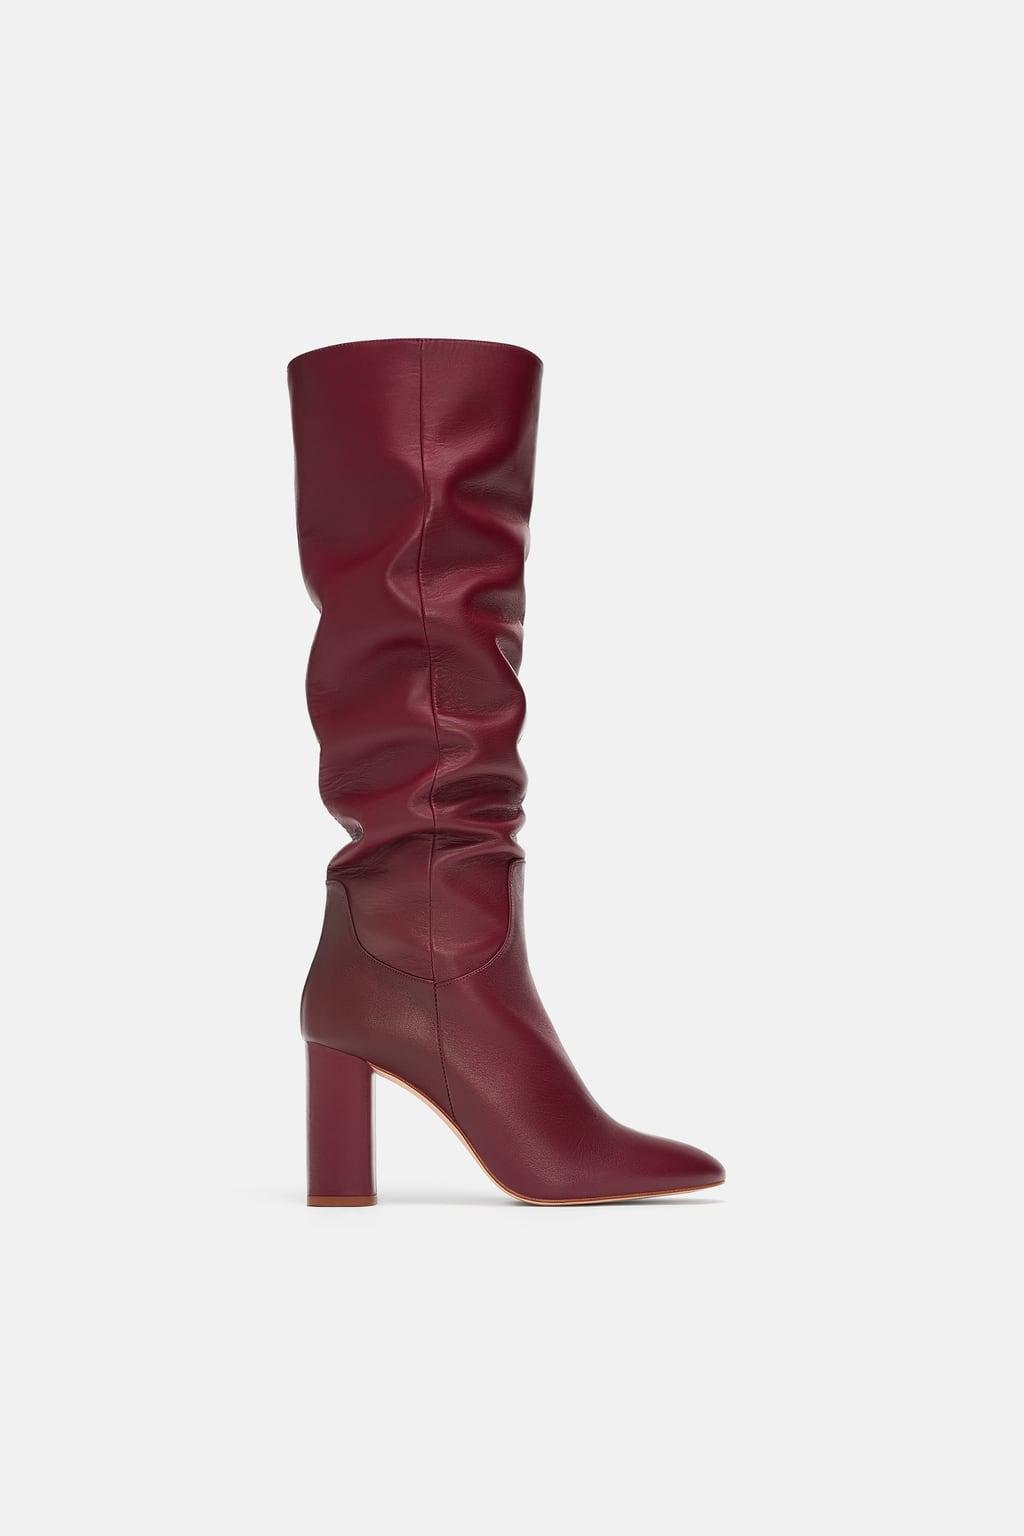 bottes cuir rouge